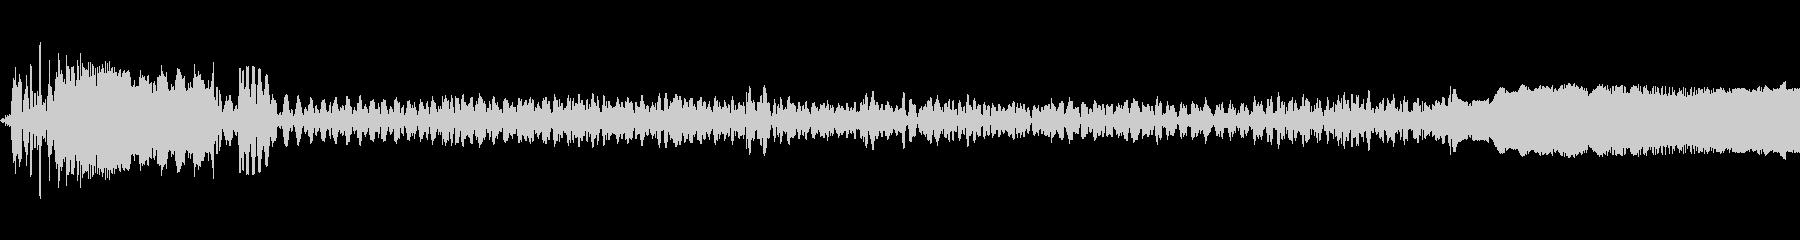 SciFi EC01_87_3の未再生の波形